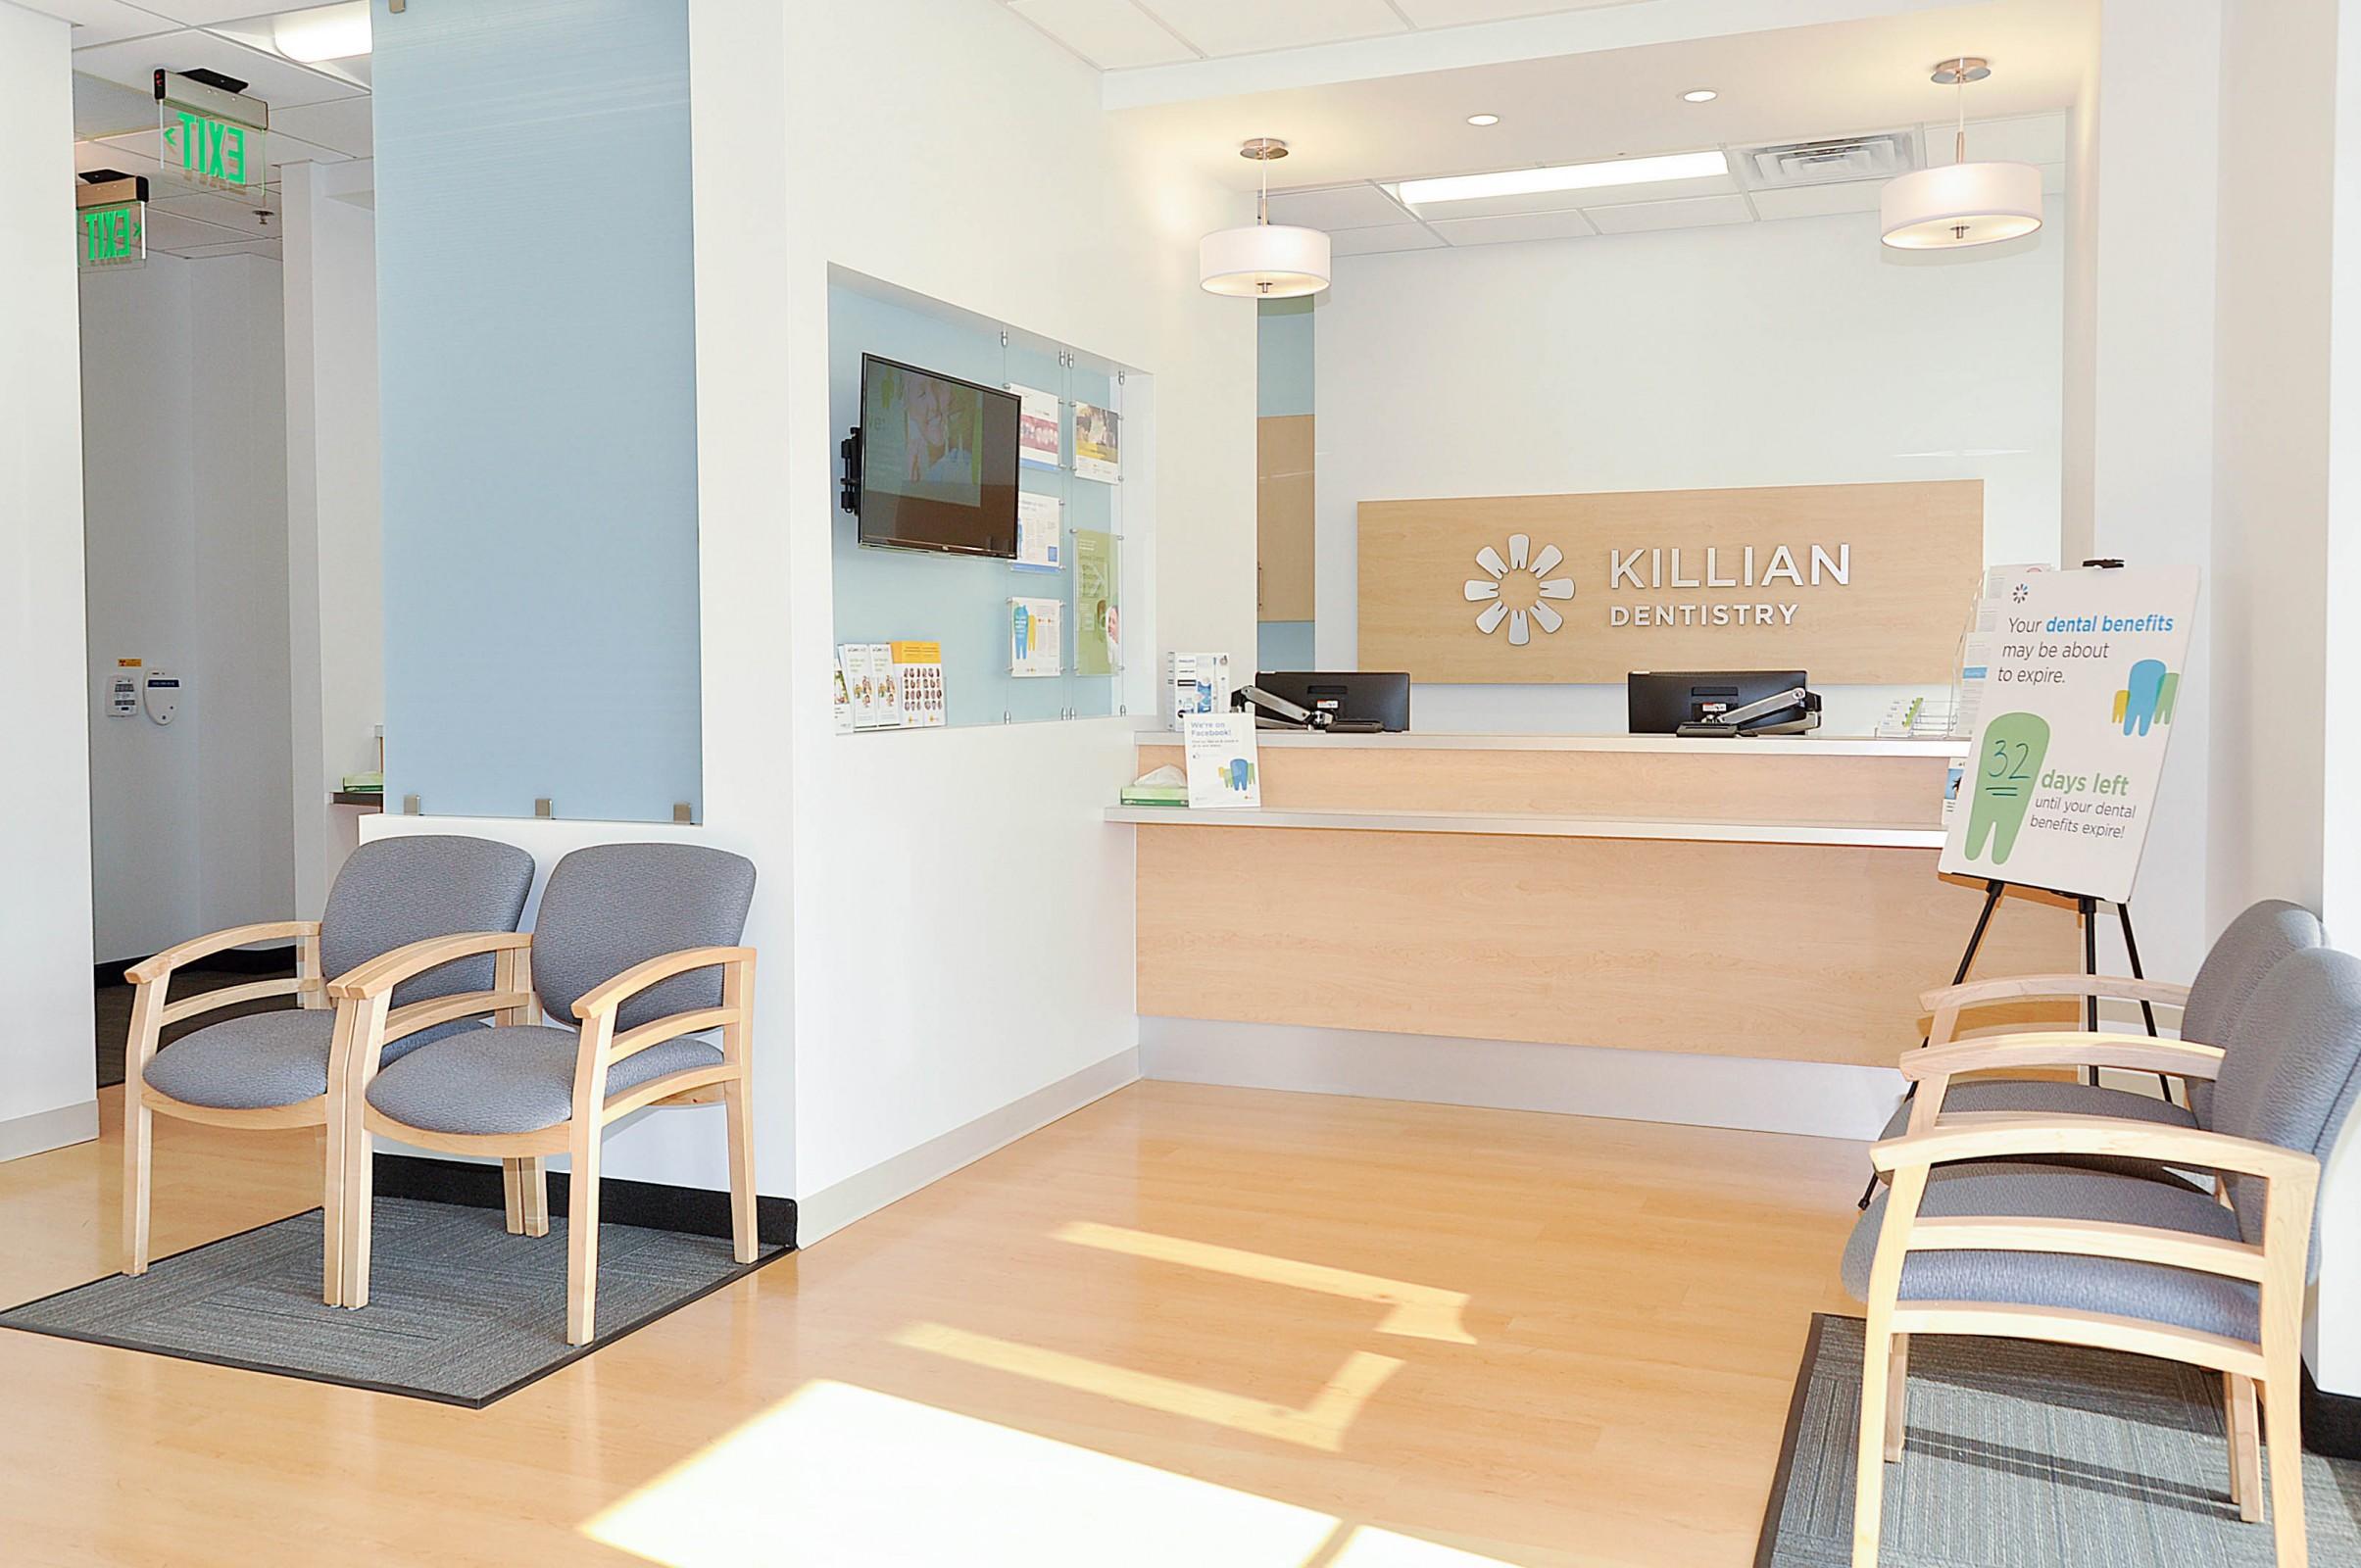 Killian Dentistry image 5